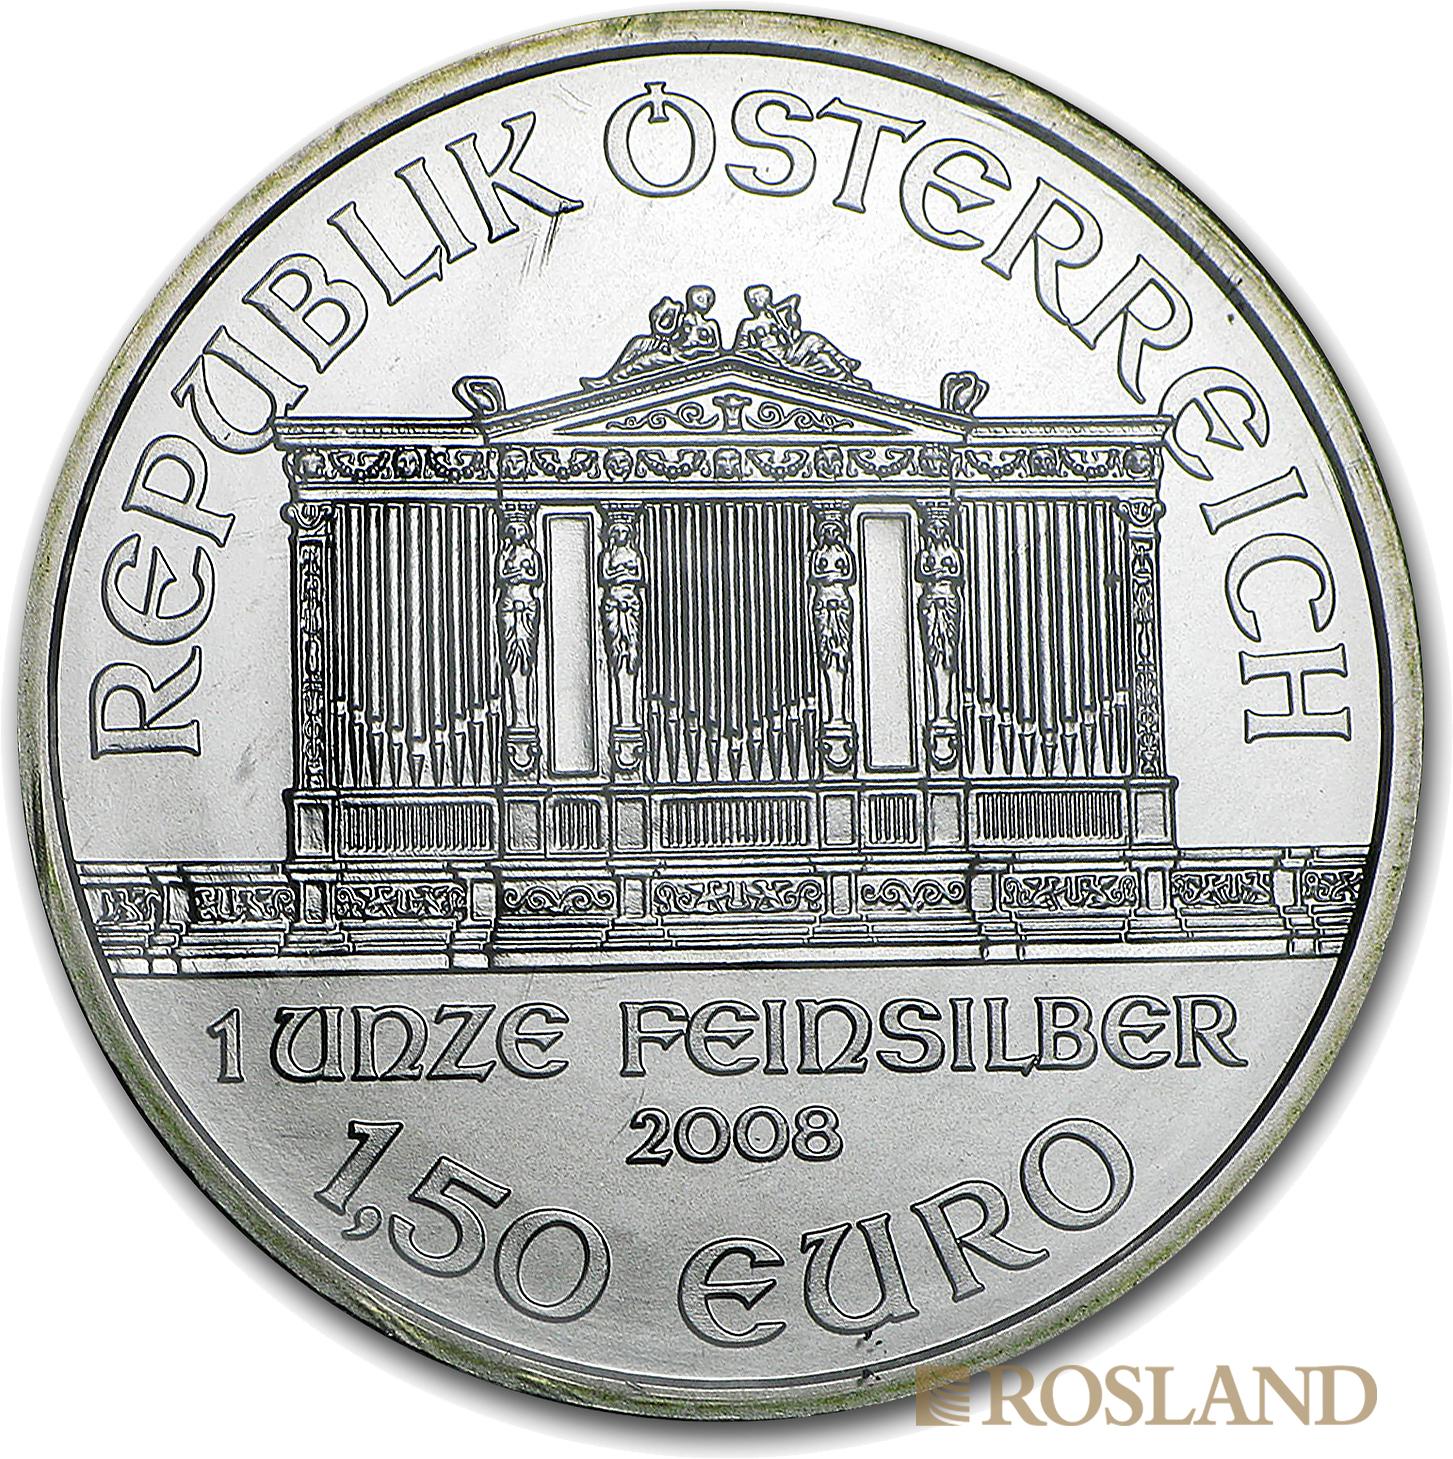 1 Unze Silbermünze Wiener Philharmoniker 2008